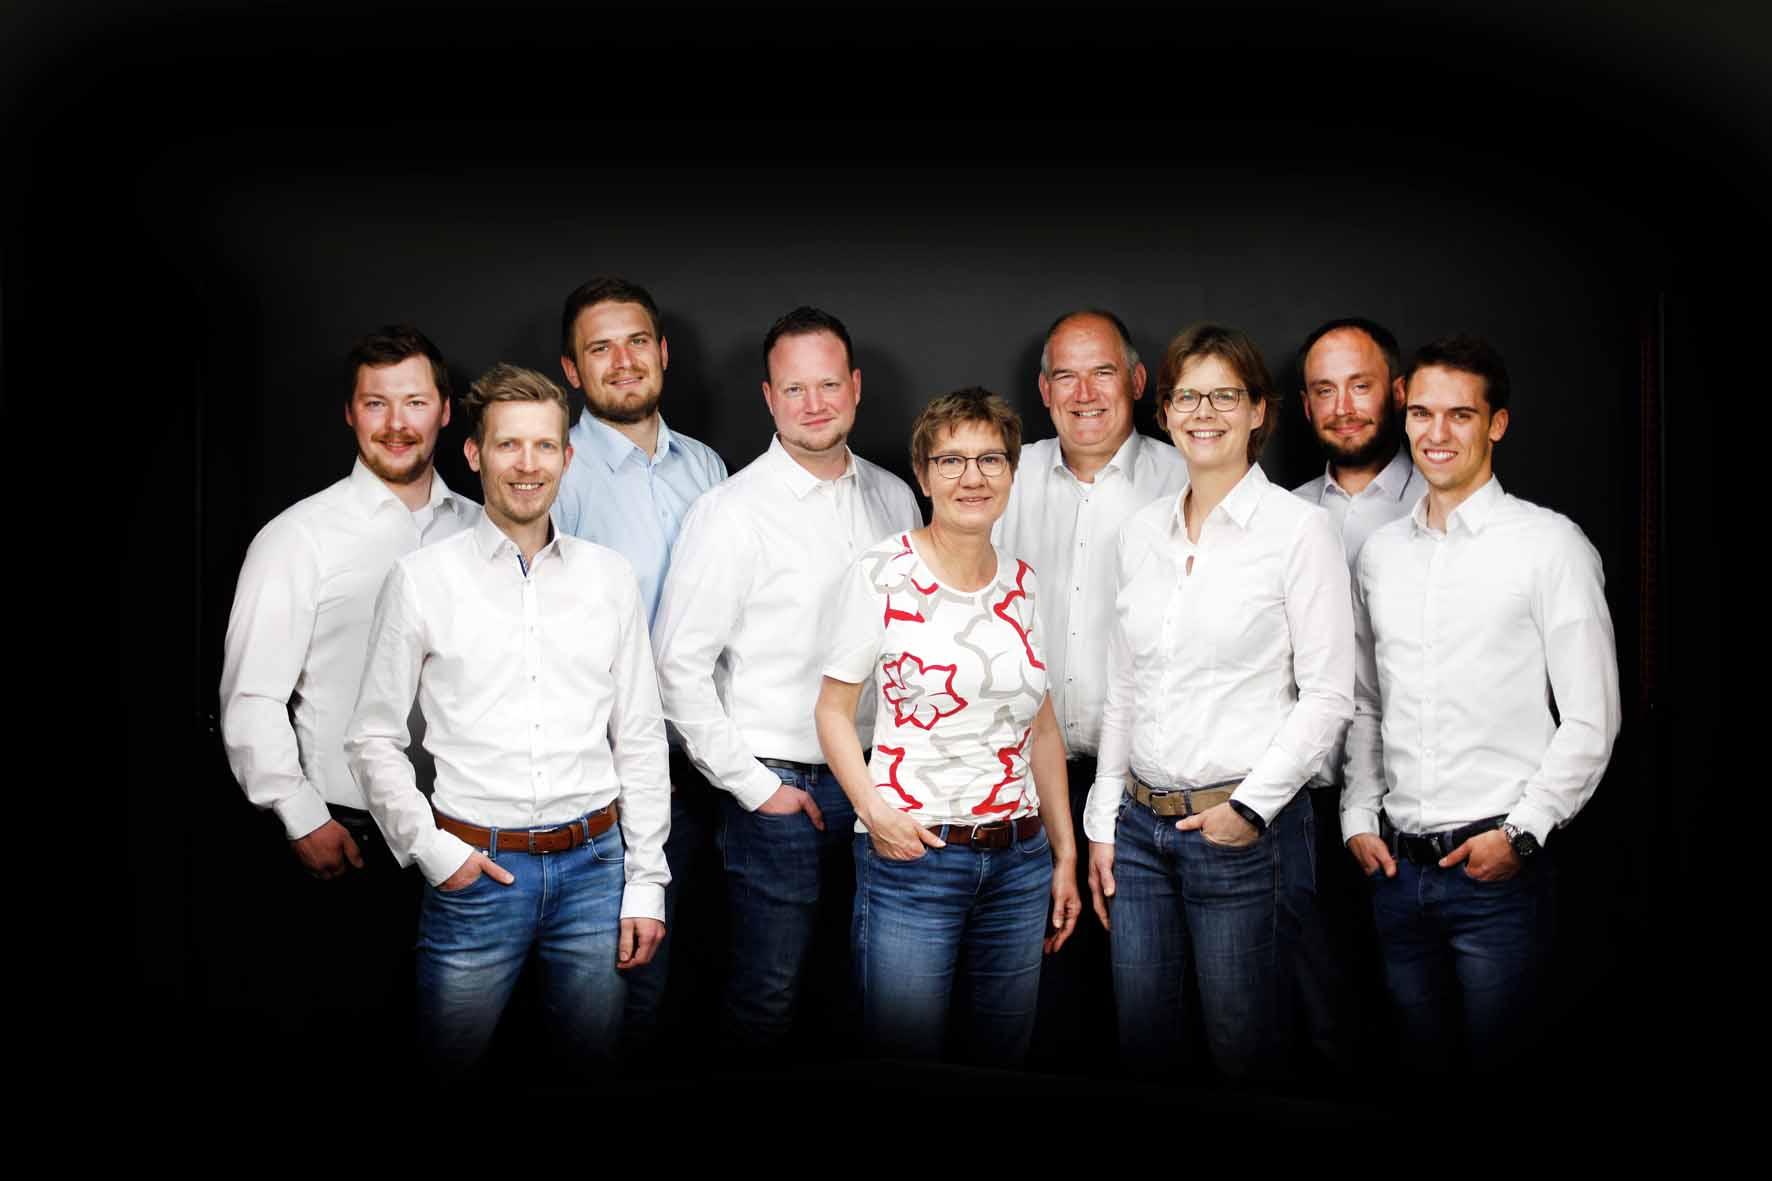 ieQ-systems, Gruppenfoto mgk-Team © ieQ-systems mgk GmbH